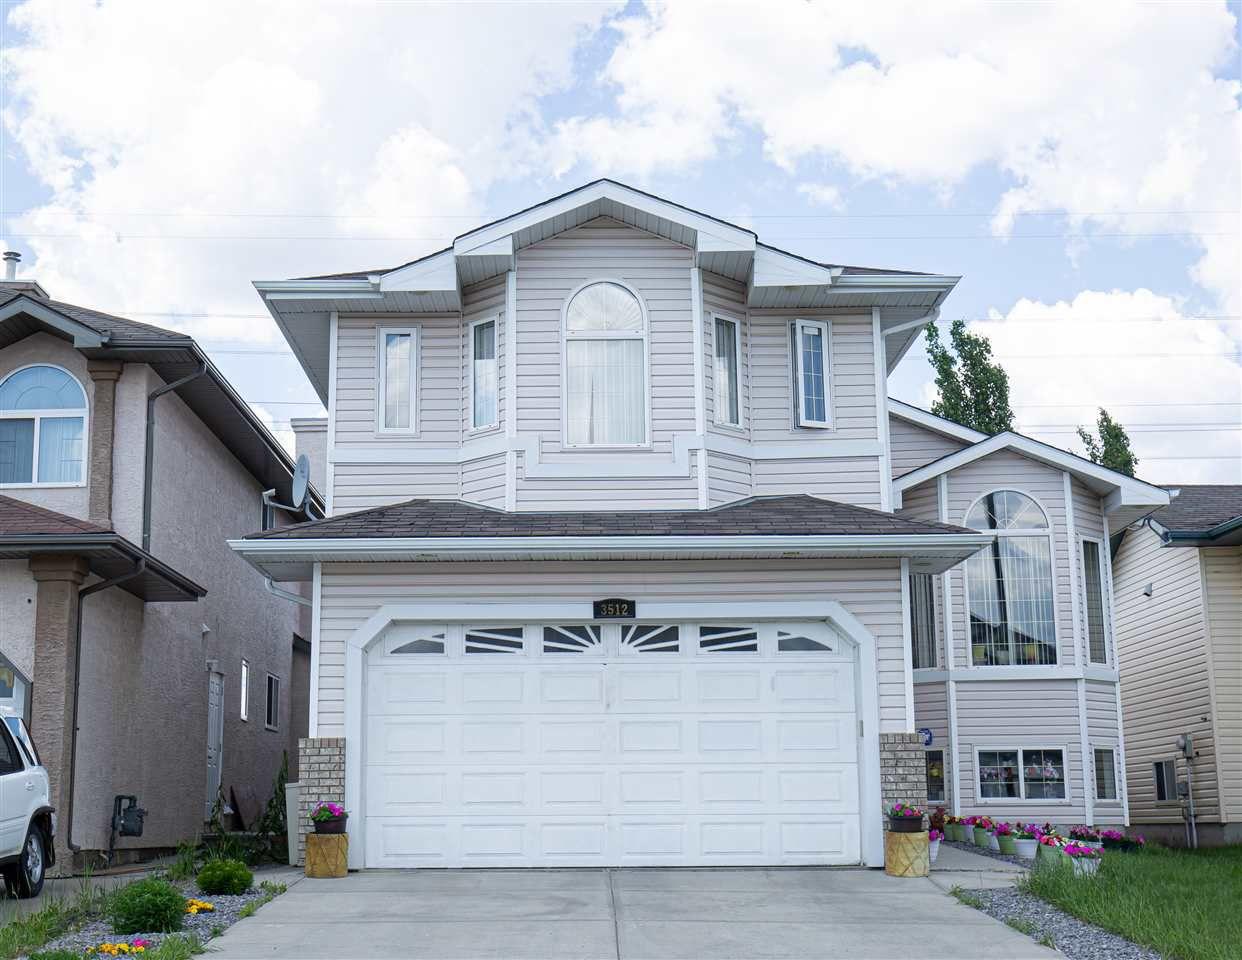 Main Photo: 3512 25 Street in Edmonton: Zone 30 House for sale : MLS®# E4162559